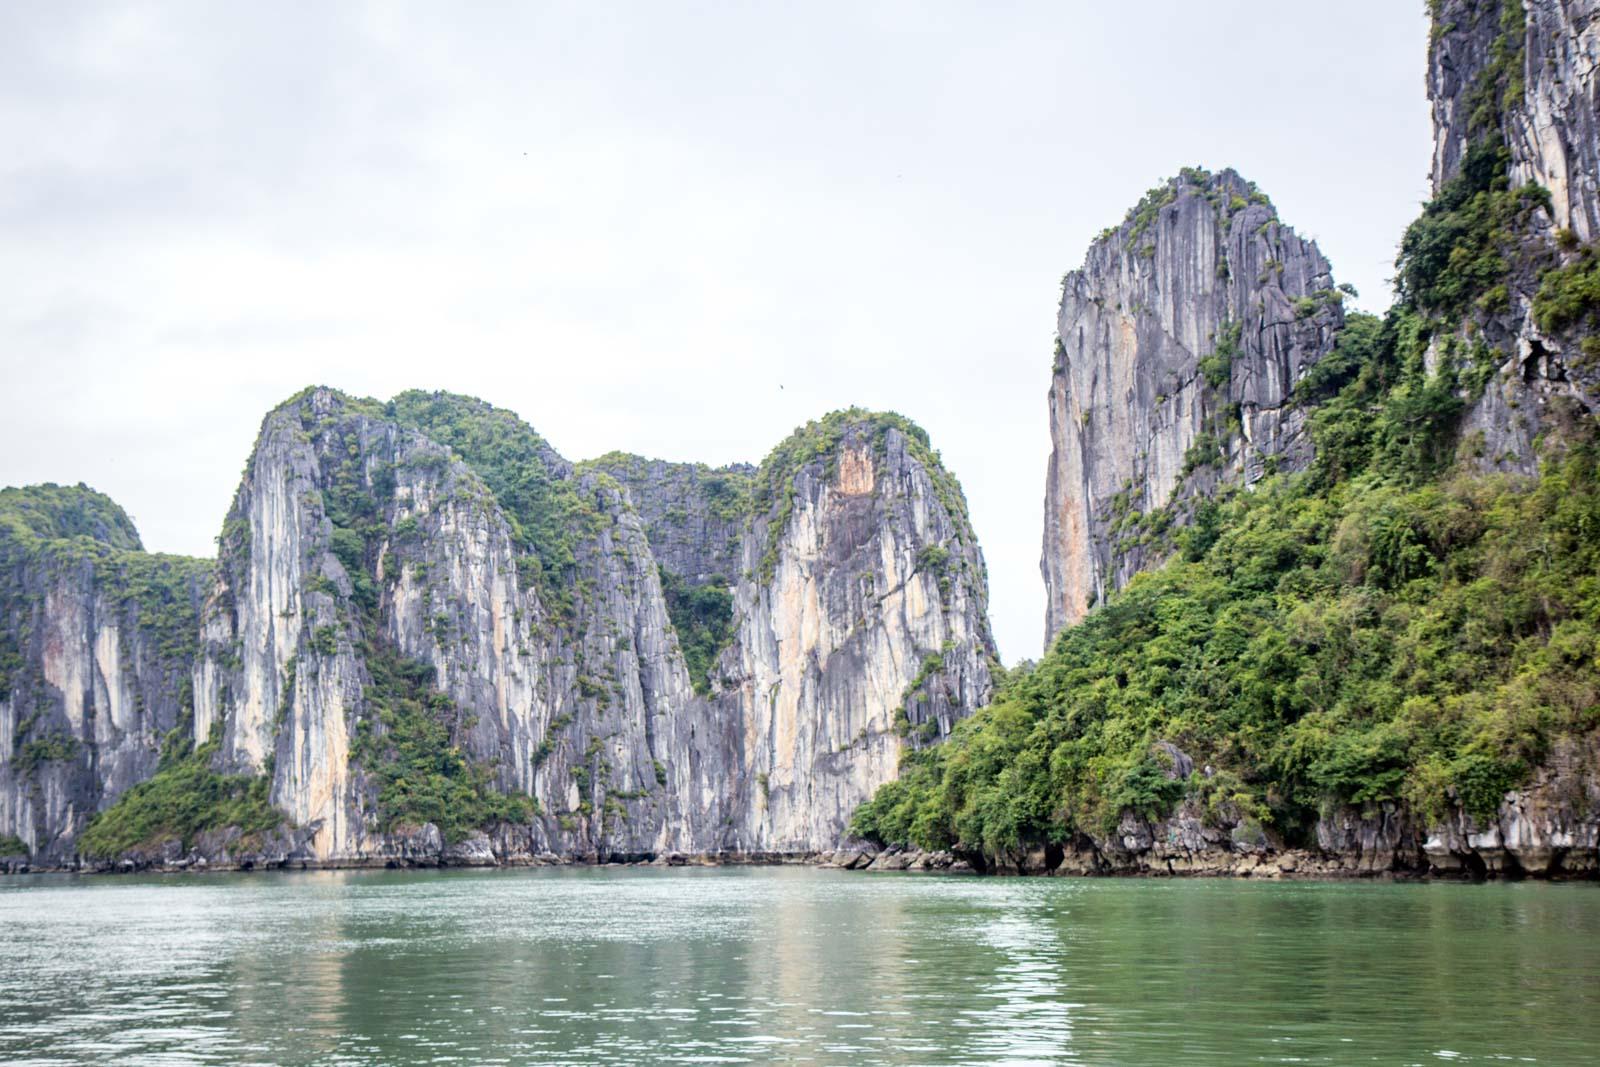 Choosing a Ha Long Bay tour, Vietnam